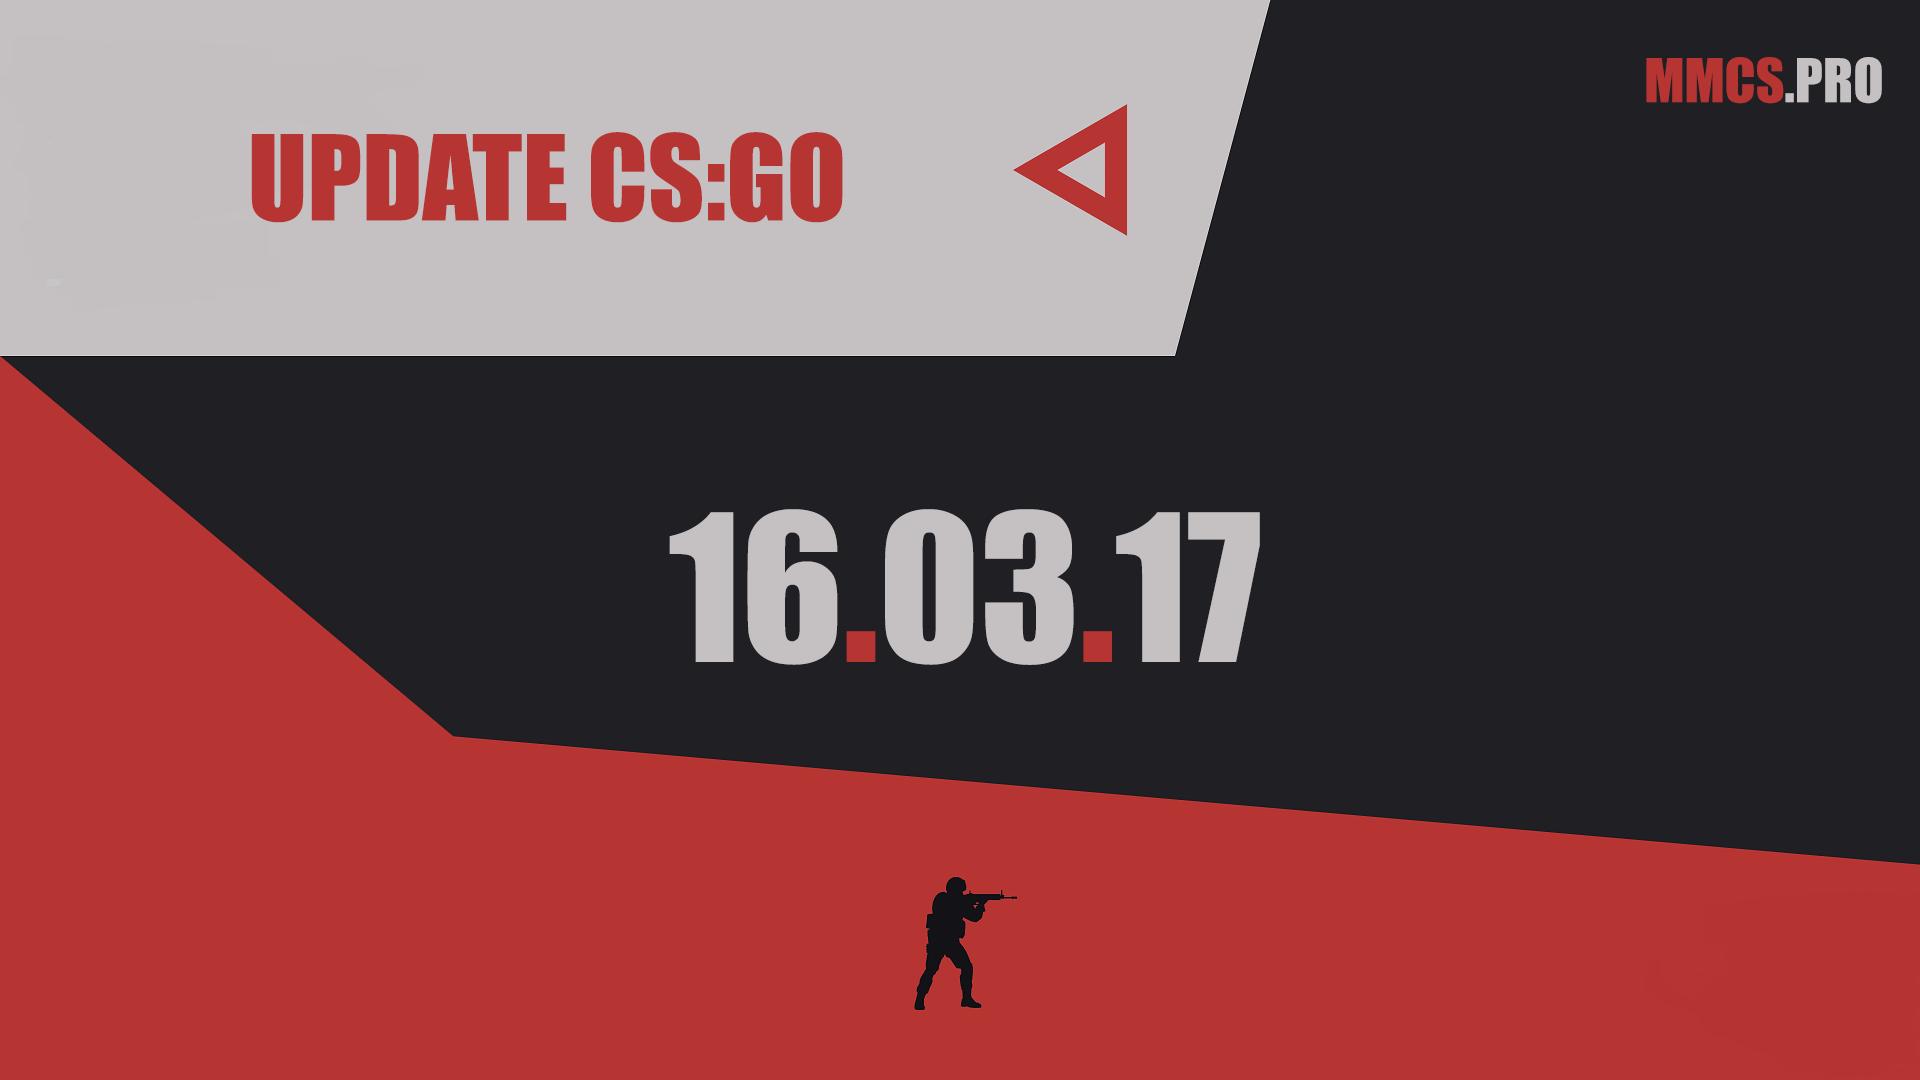 https://mmcs.pro/update-csgo-16-03-2017-valve/